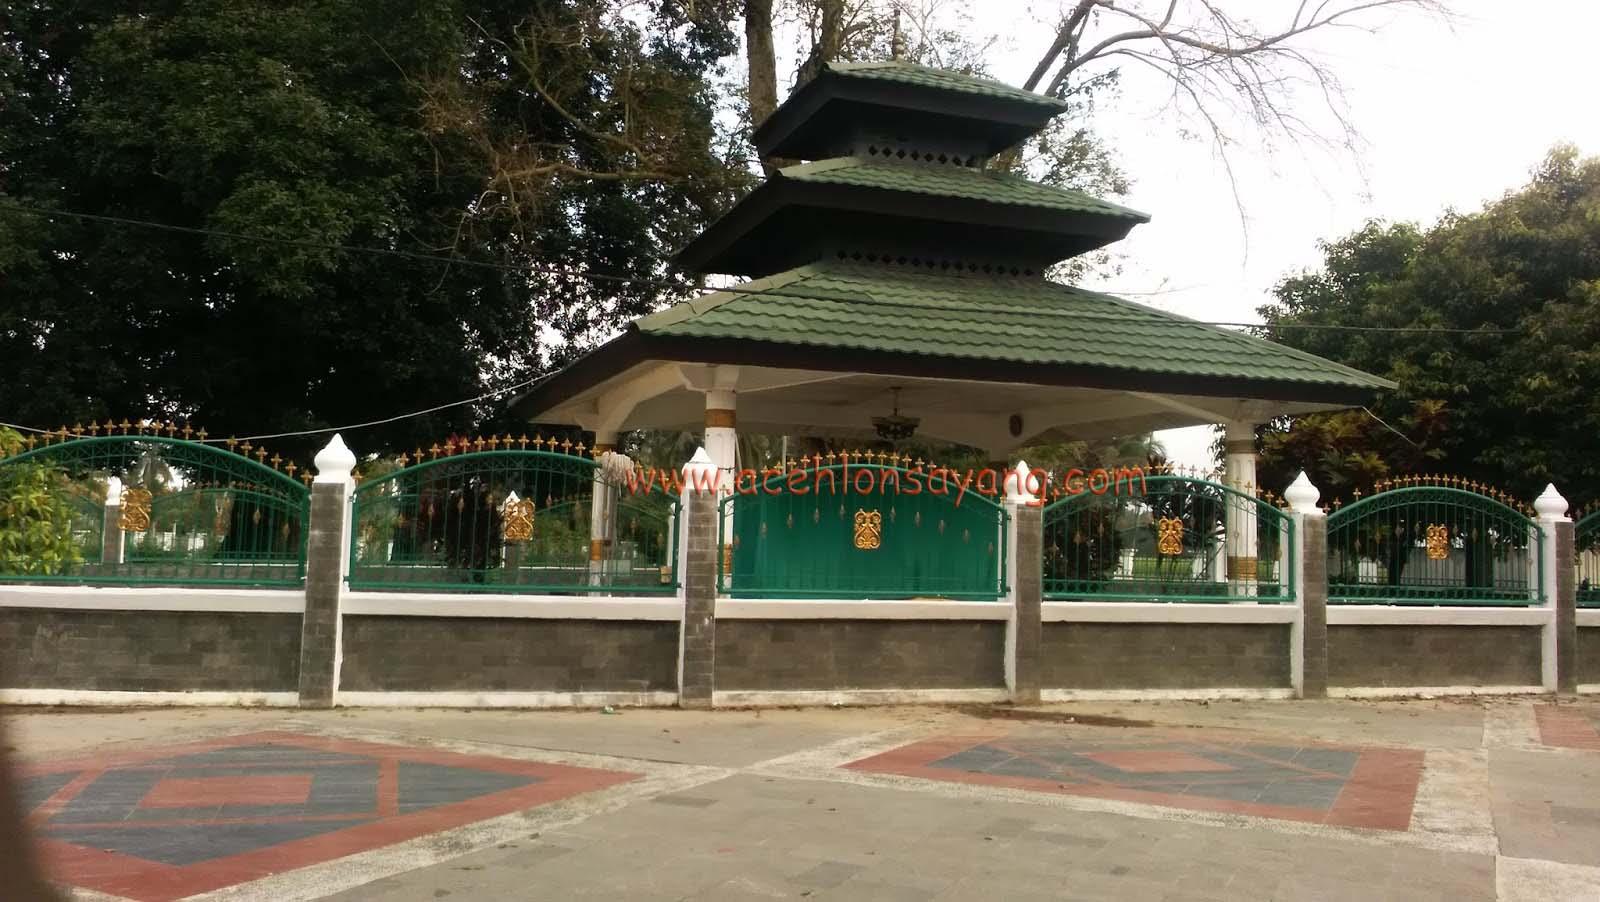 Makam Raja Samudra Pasai, Sultan Malikussaleh